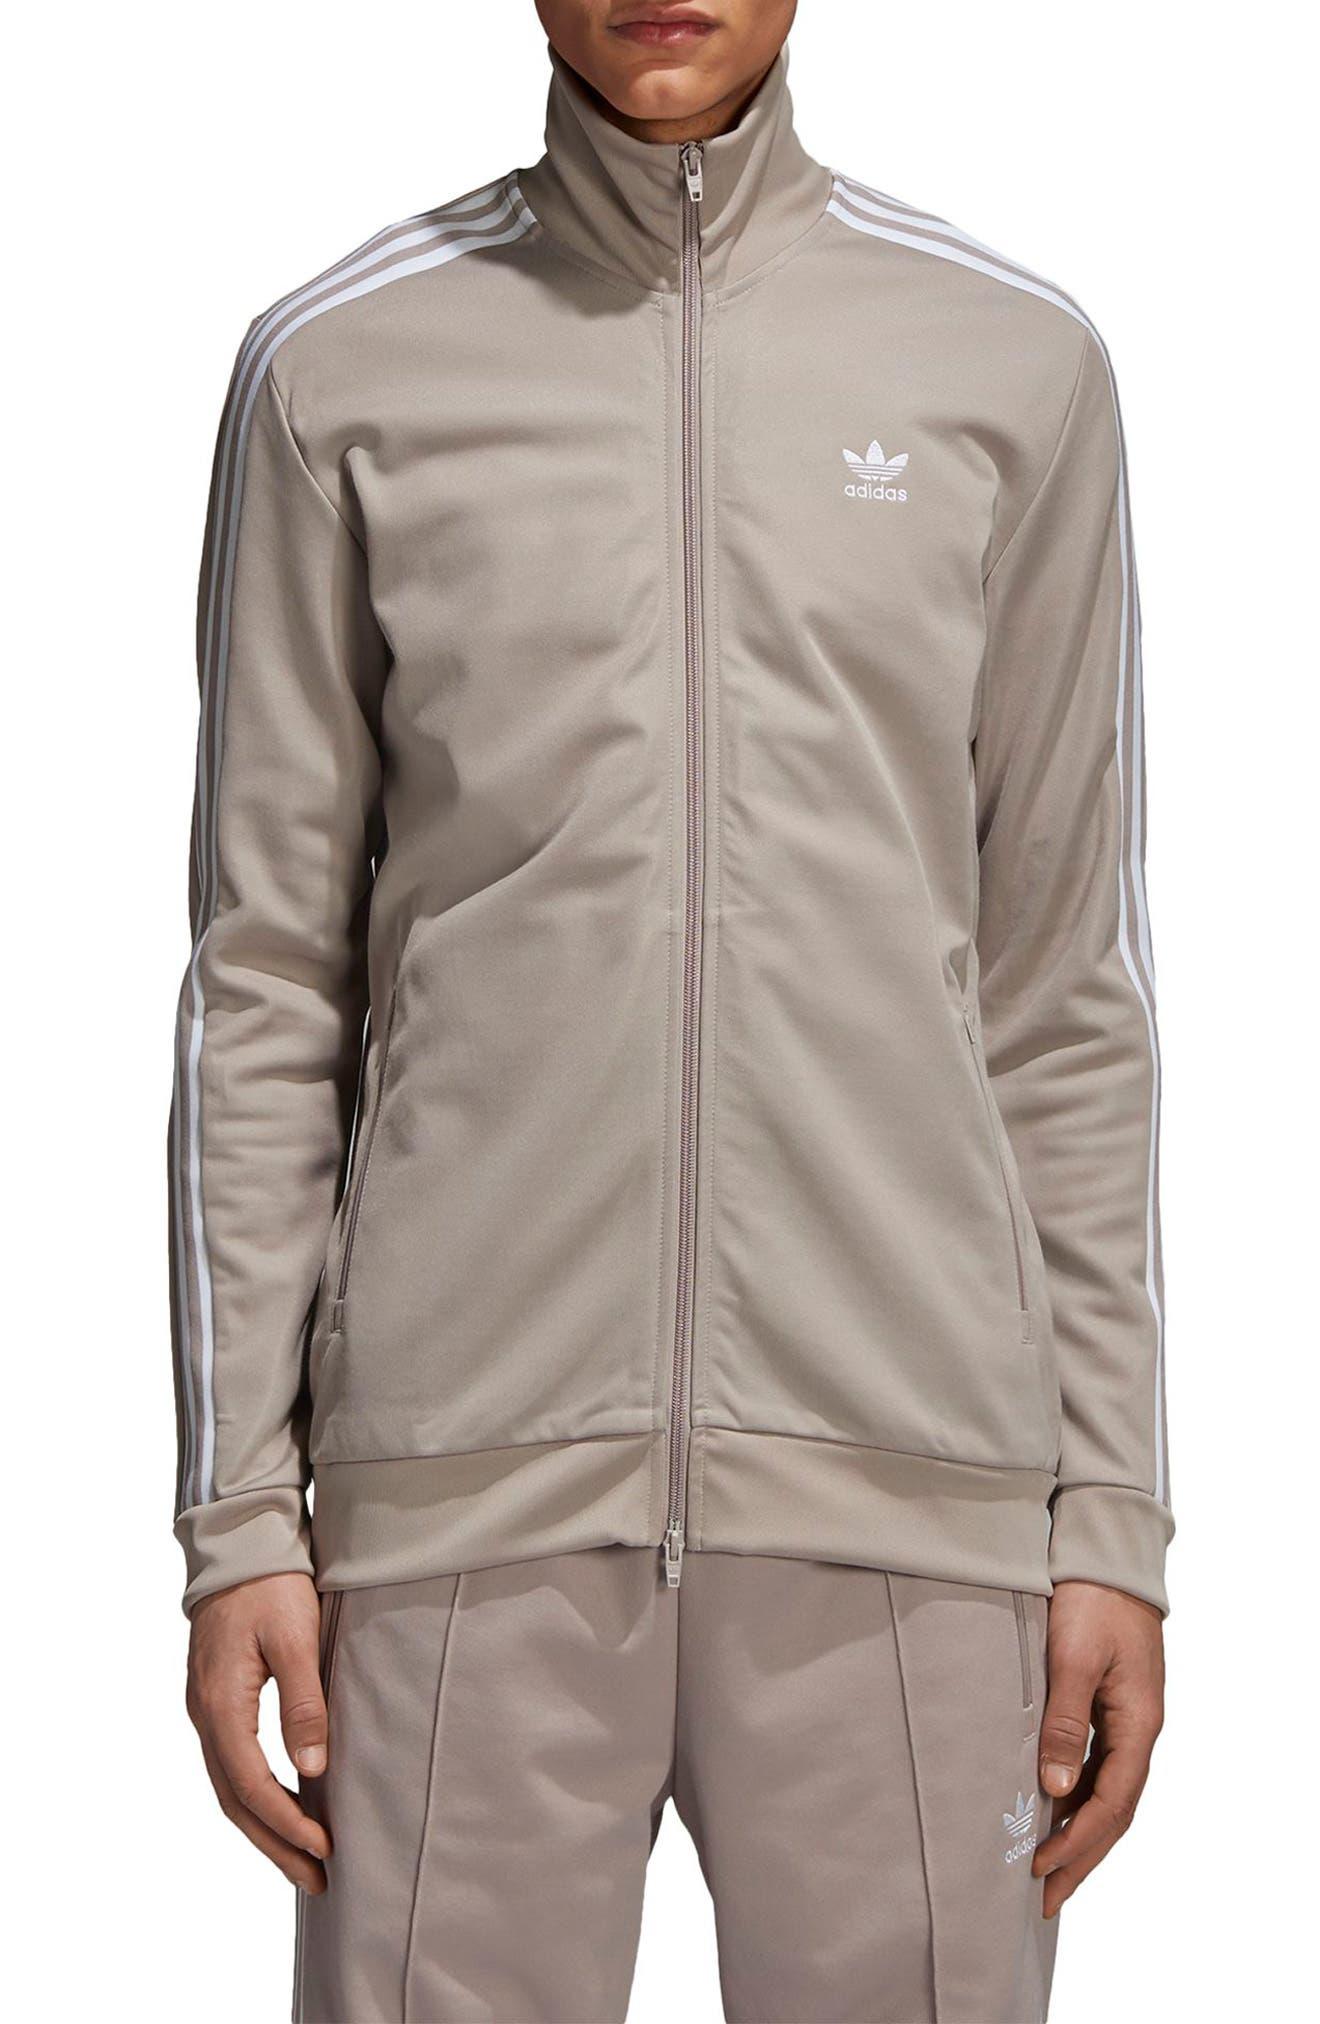 Main Image - adidas Originals Beckenbauer Track Jacket